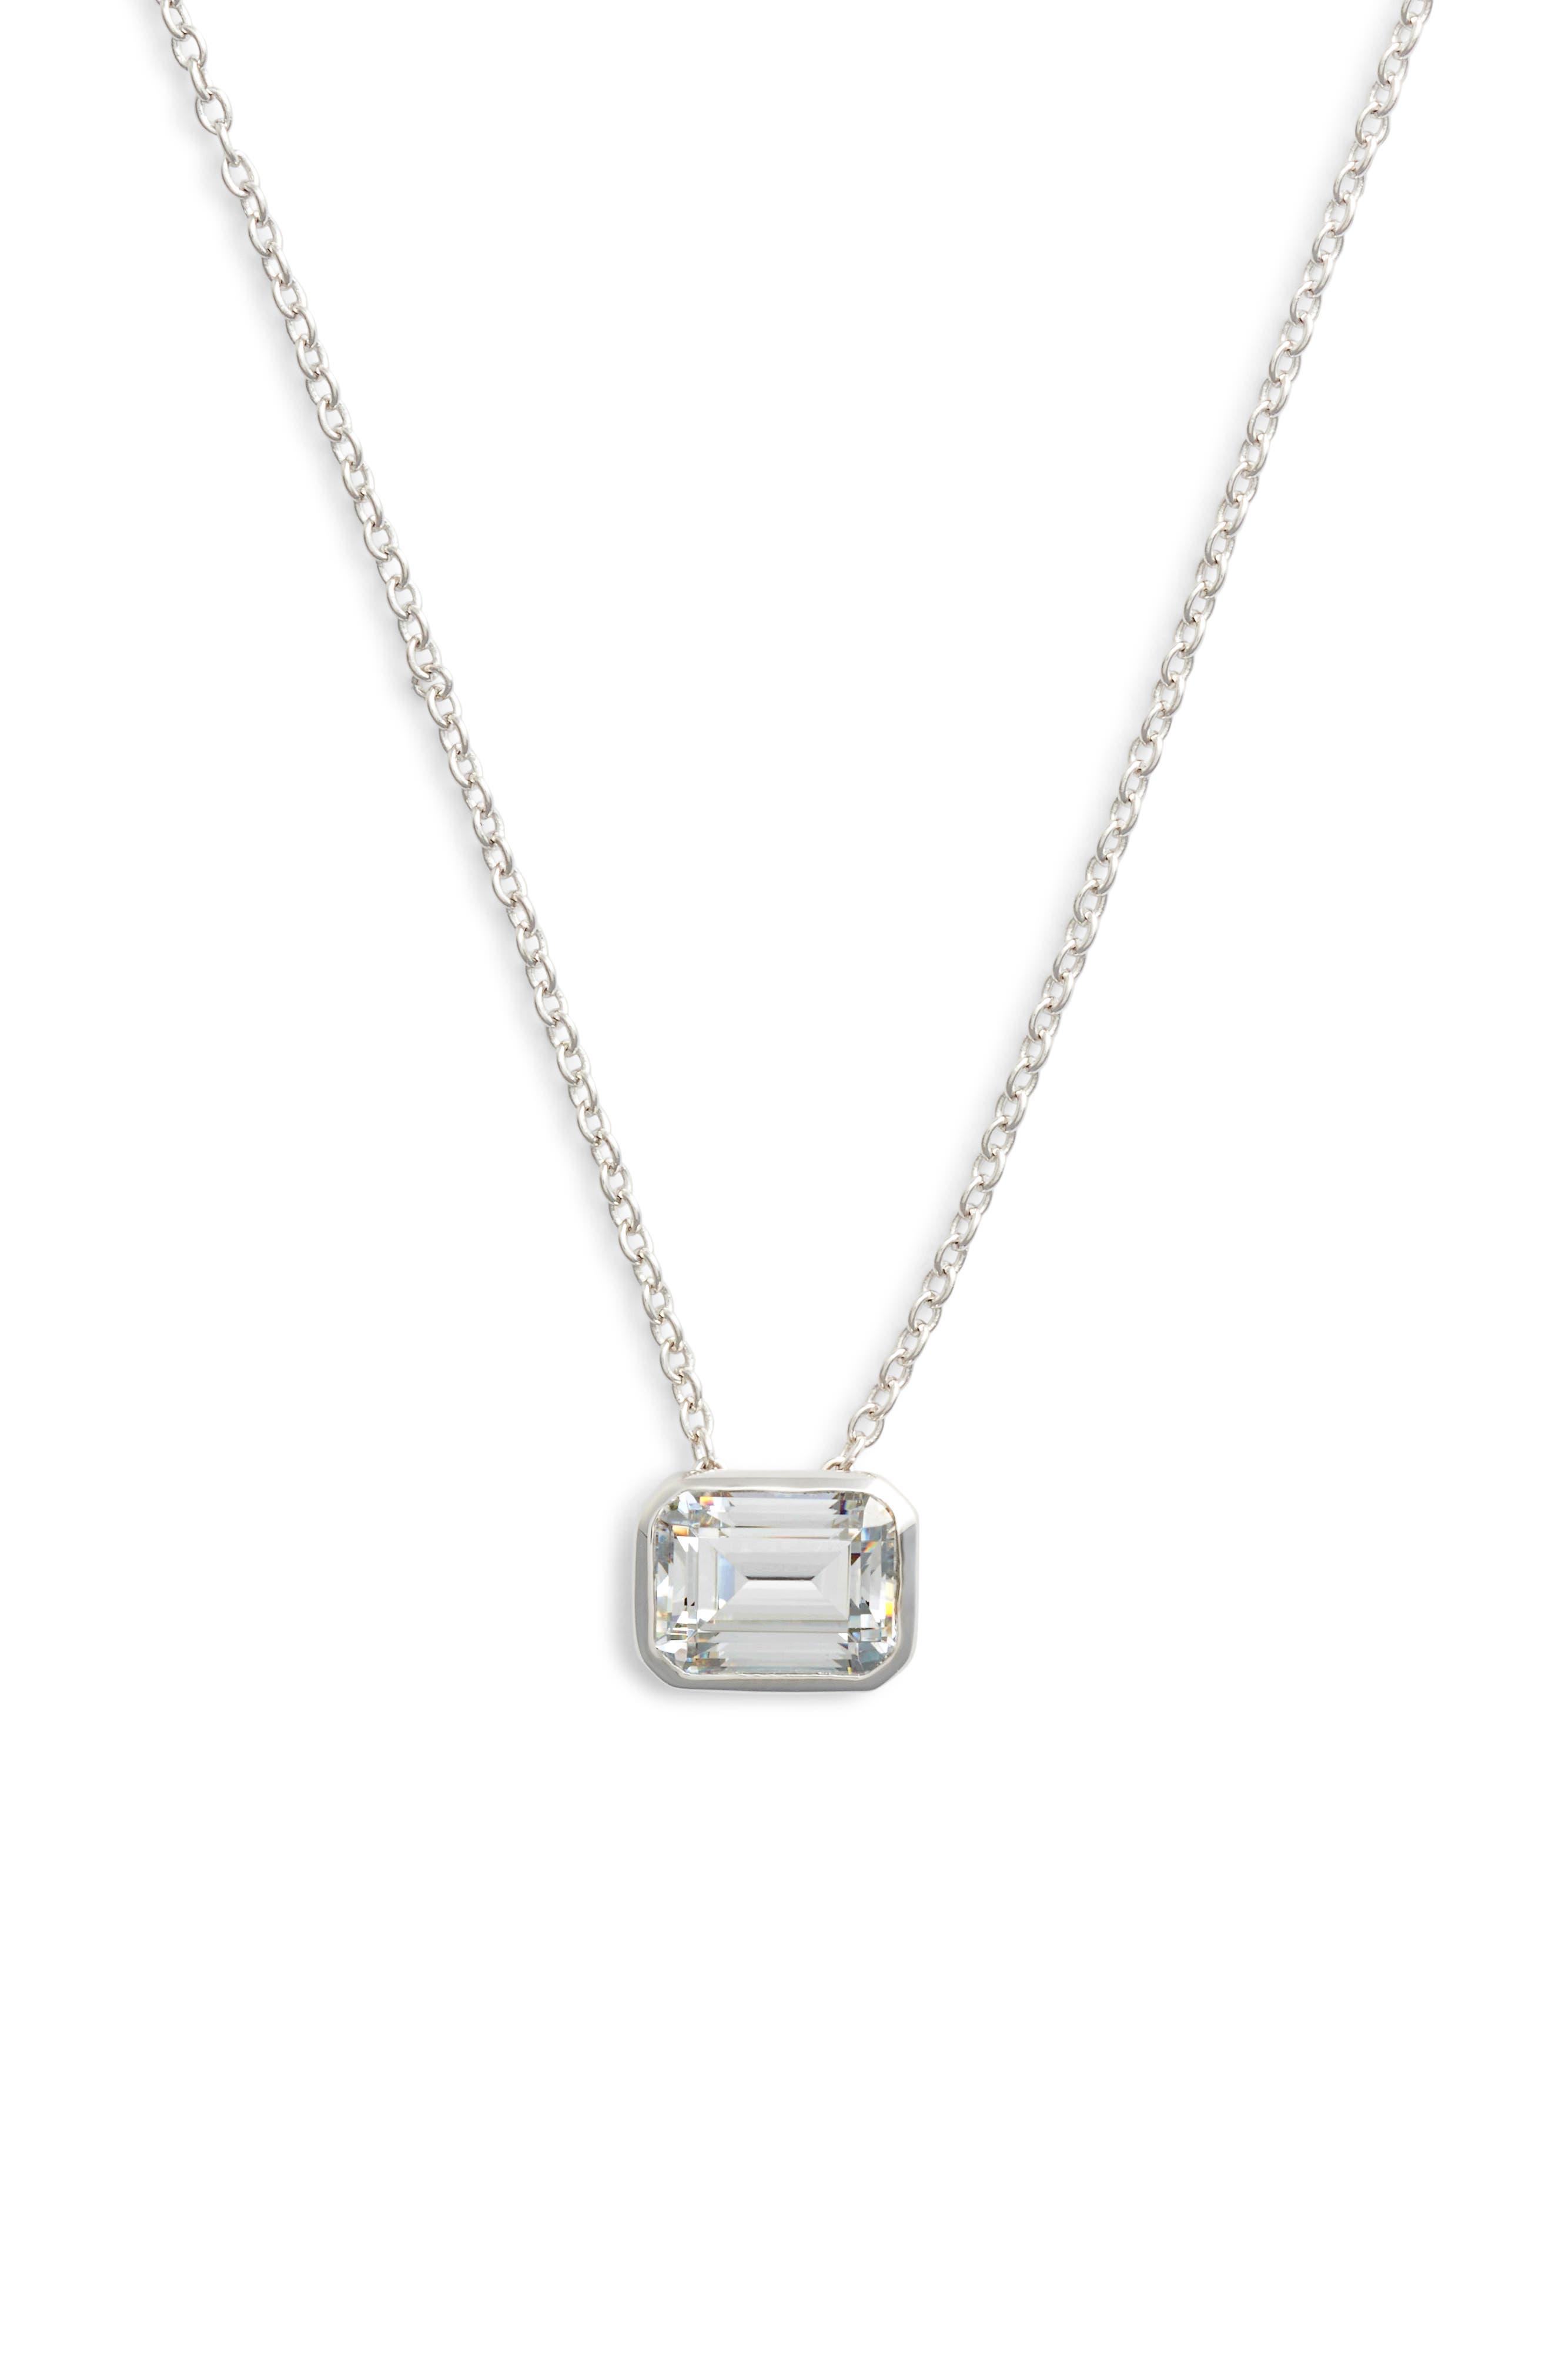 Bezel-Set Emerald-Cut Choker Necklace,                         Main,                         color, SILVER/ CLEAR